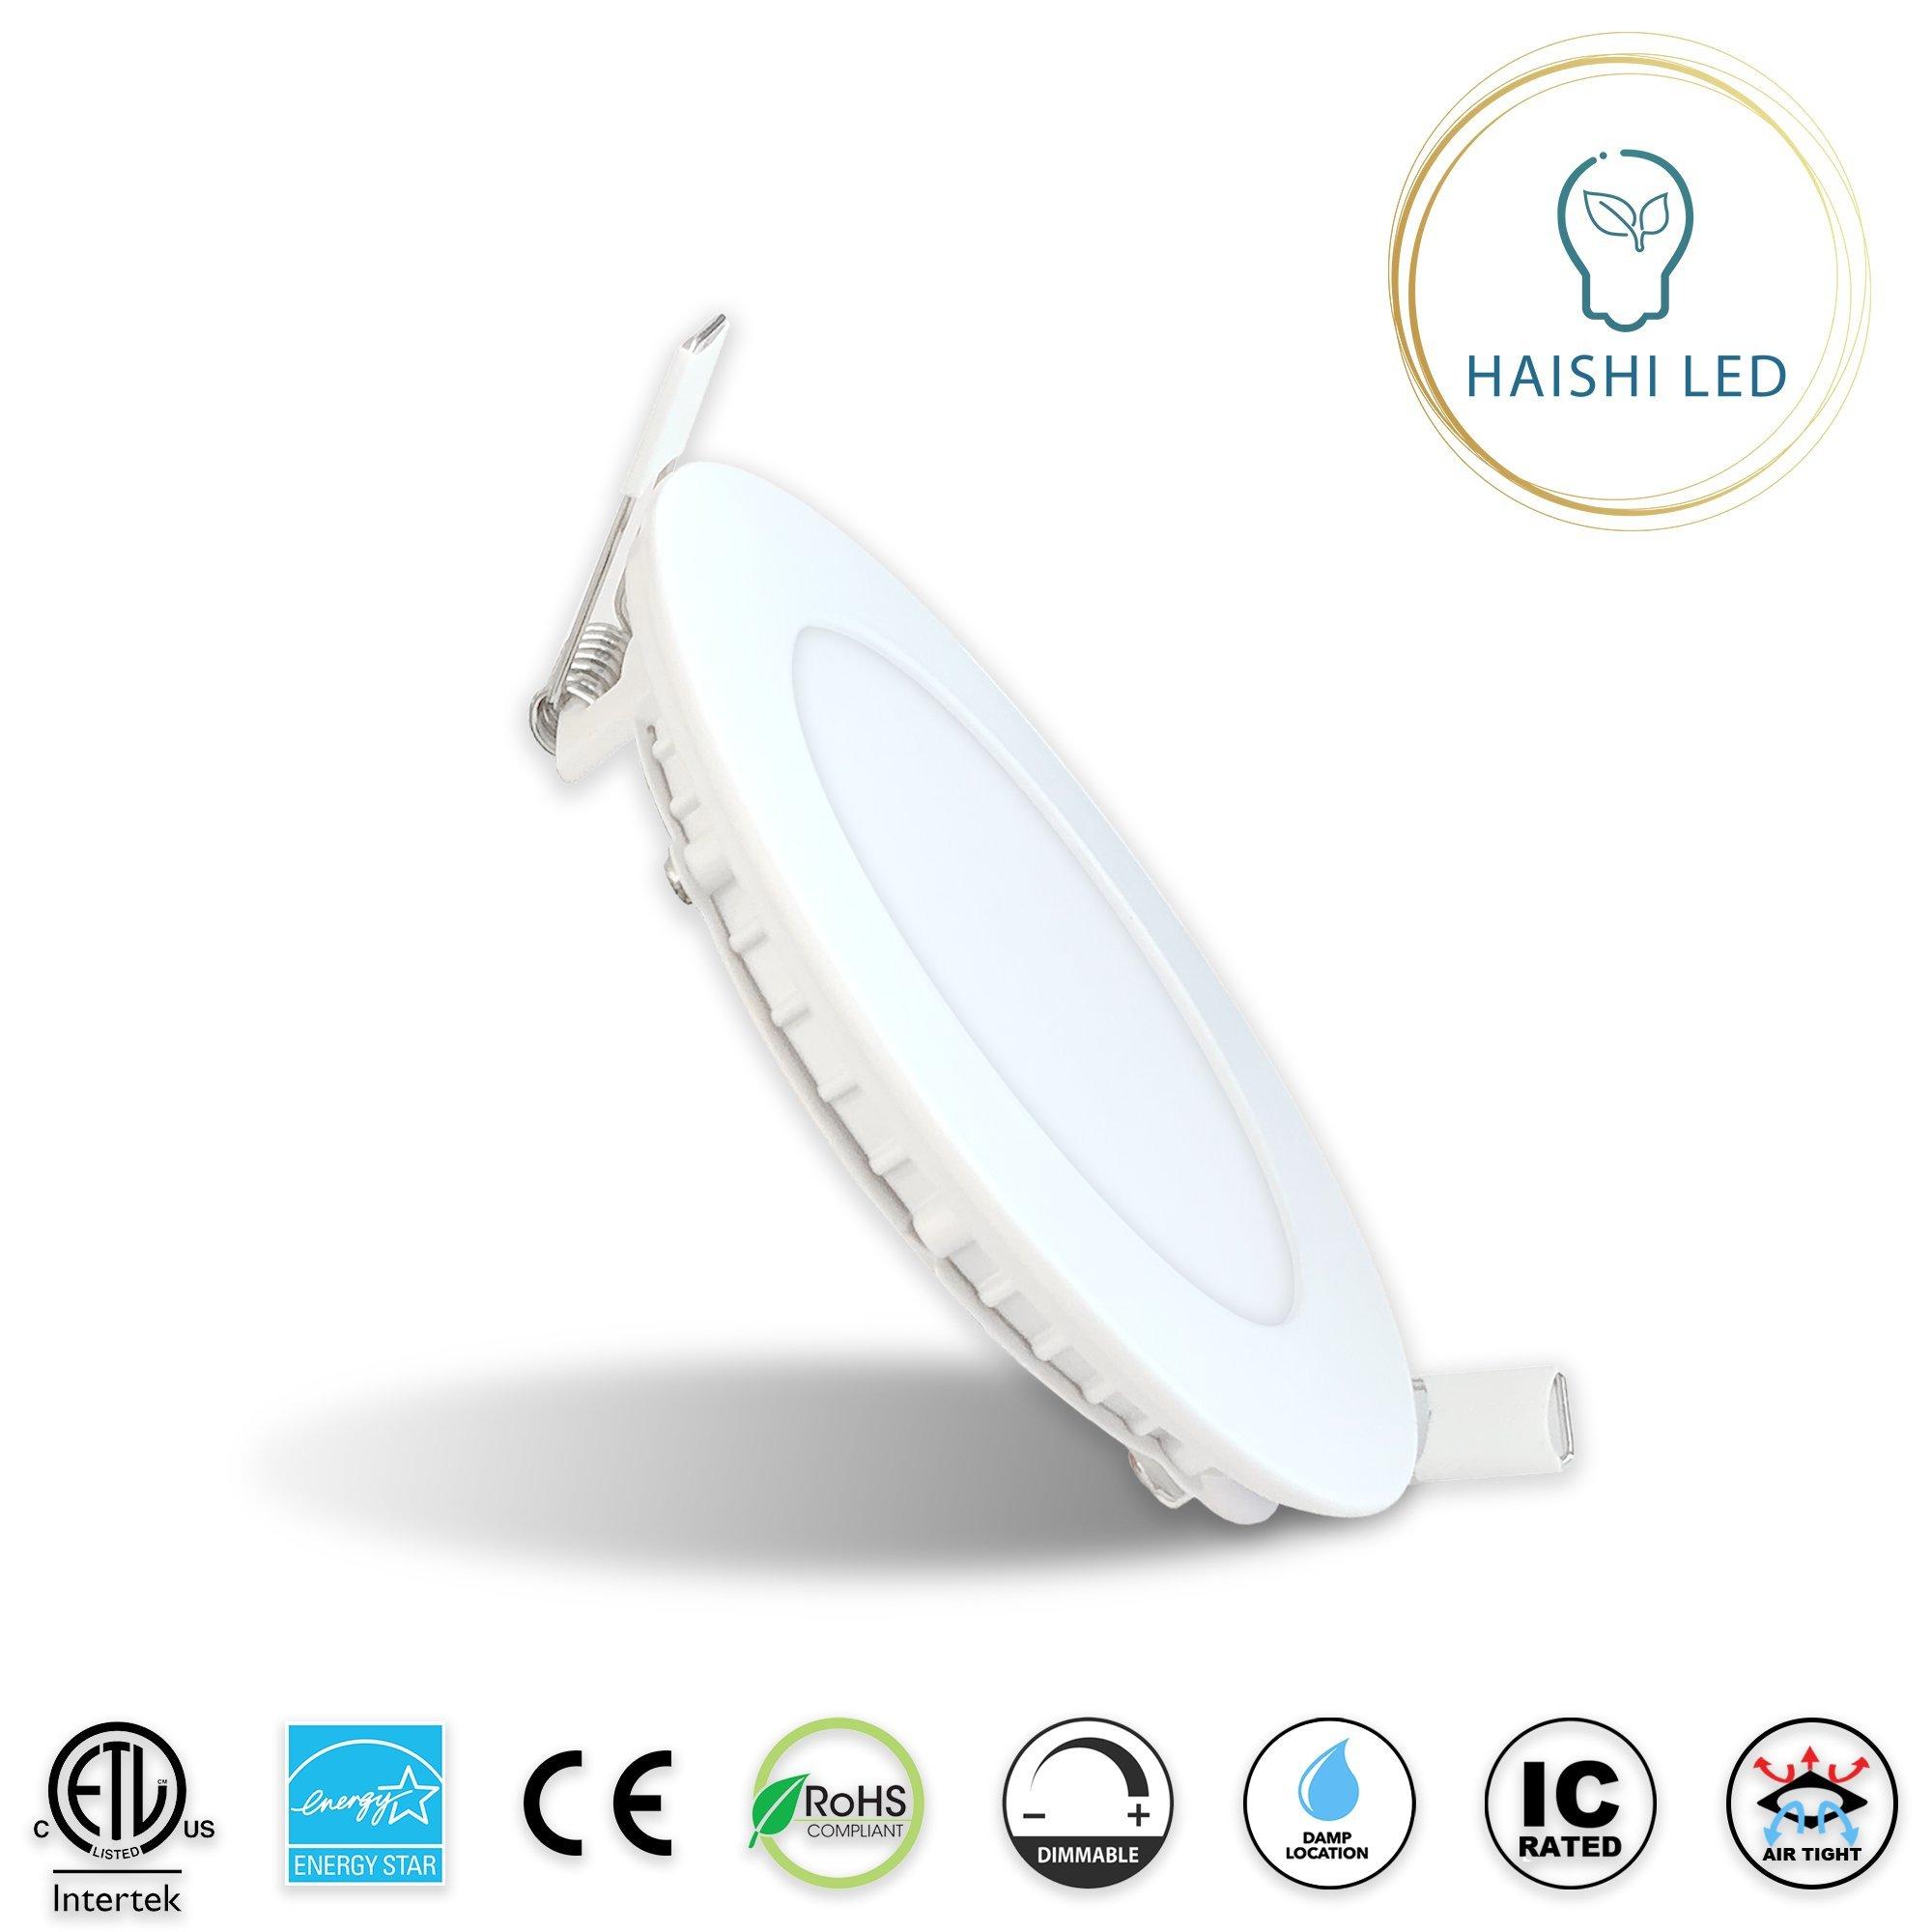 HAISHI 4-Inch 9W 120V Recessed Ultra Thin Ceiling LED Downlight Air Tight Retrofit Slim IC Rated ETL Energy Star 750 Lumens 3000K